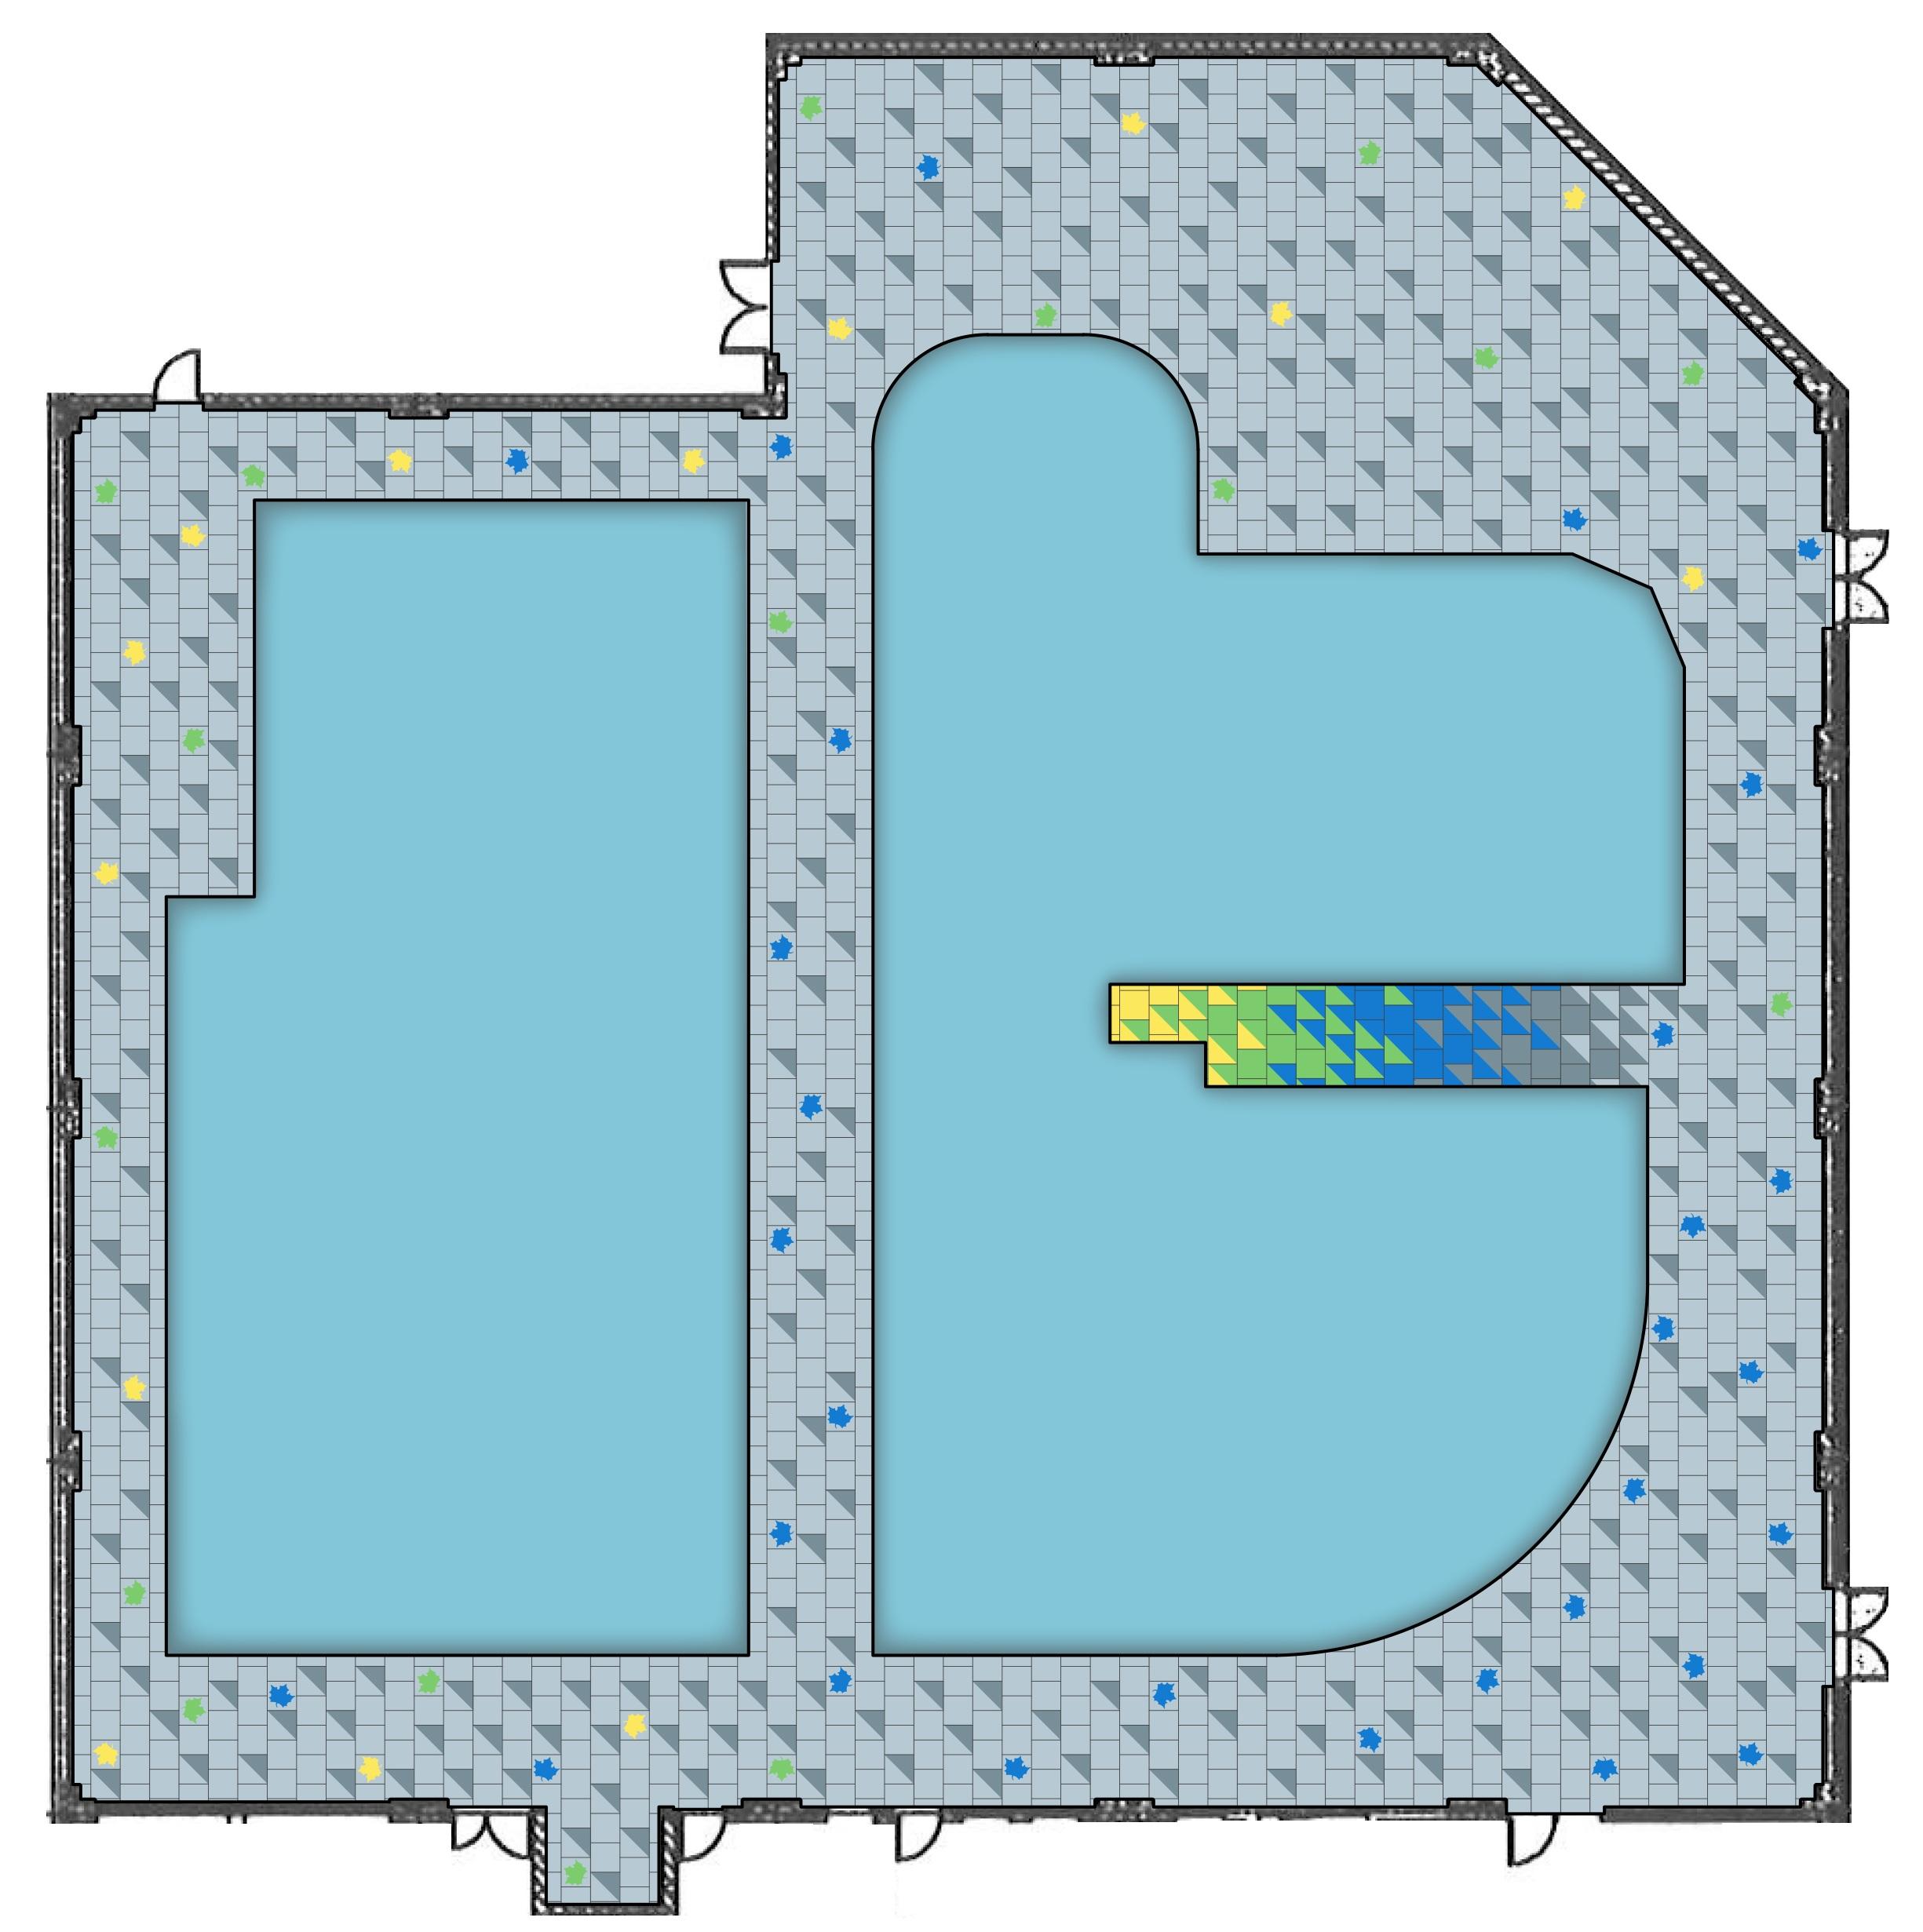 Boulder+Pool+Deck+w+Accents+%281%29.jpg